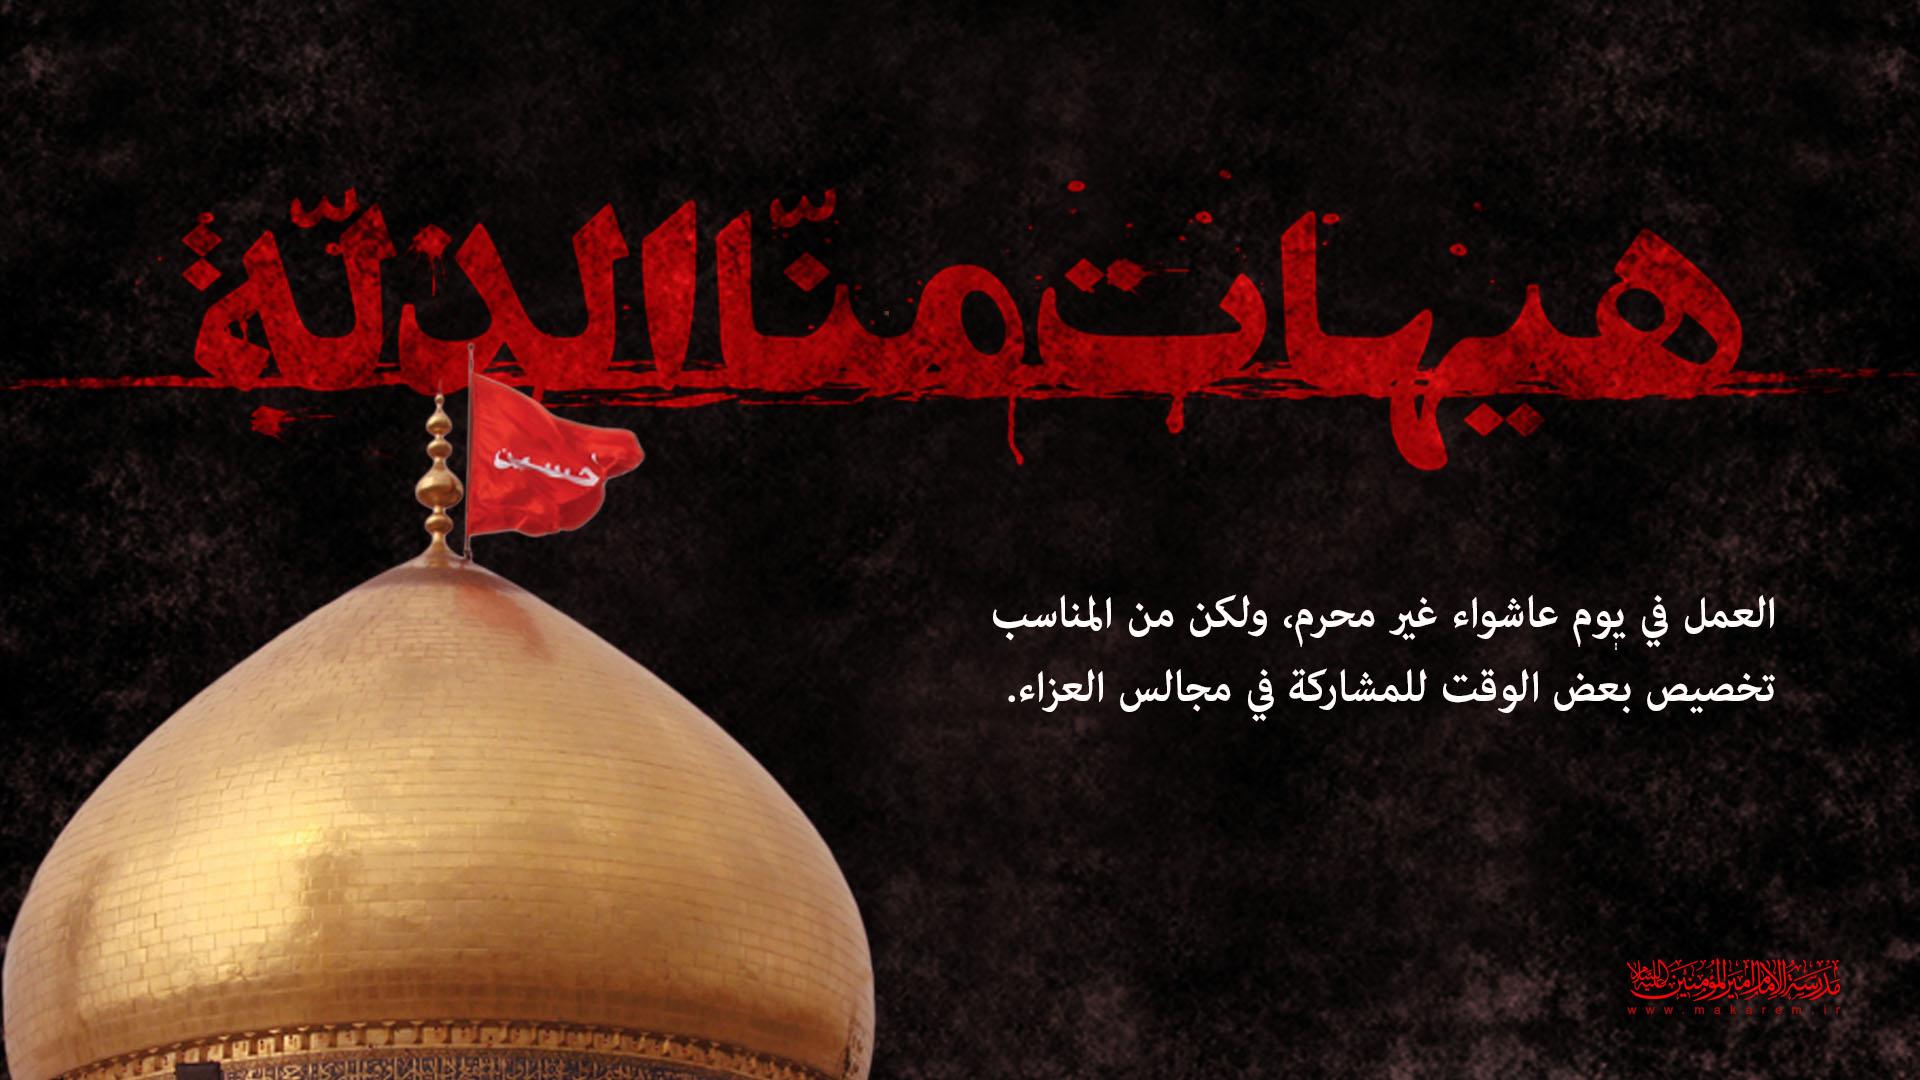 یازینب-مدرسه الامام امیر المومنین (ع)